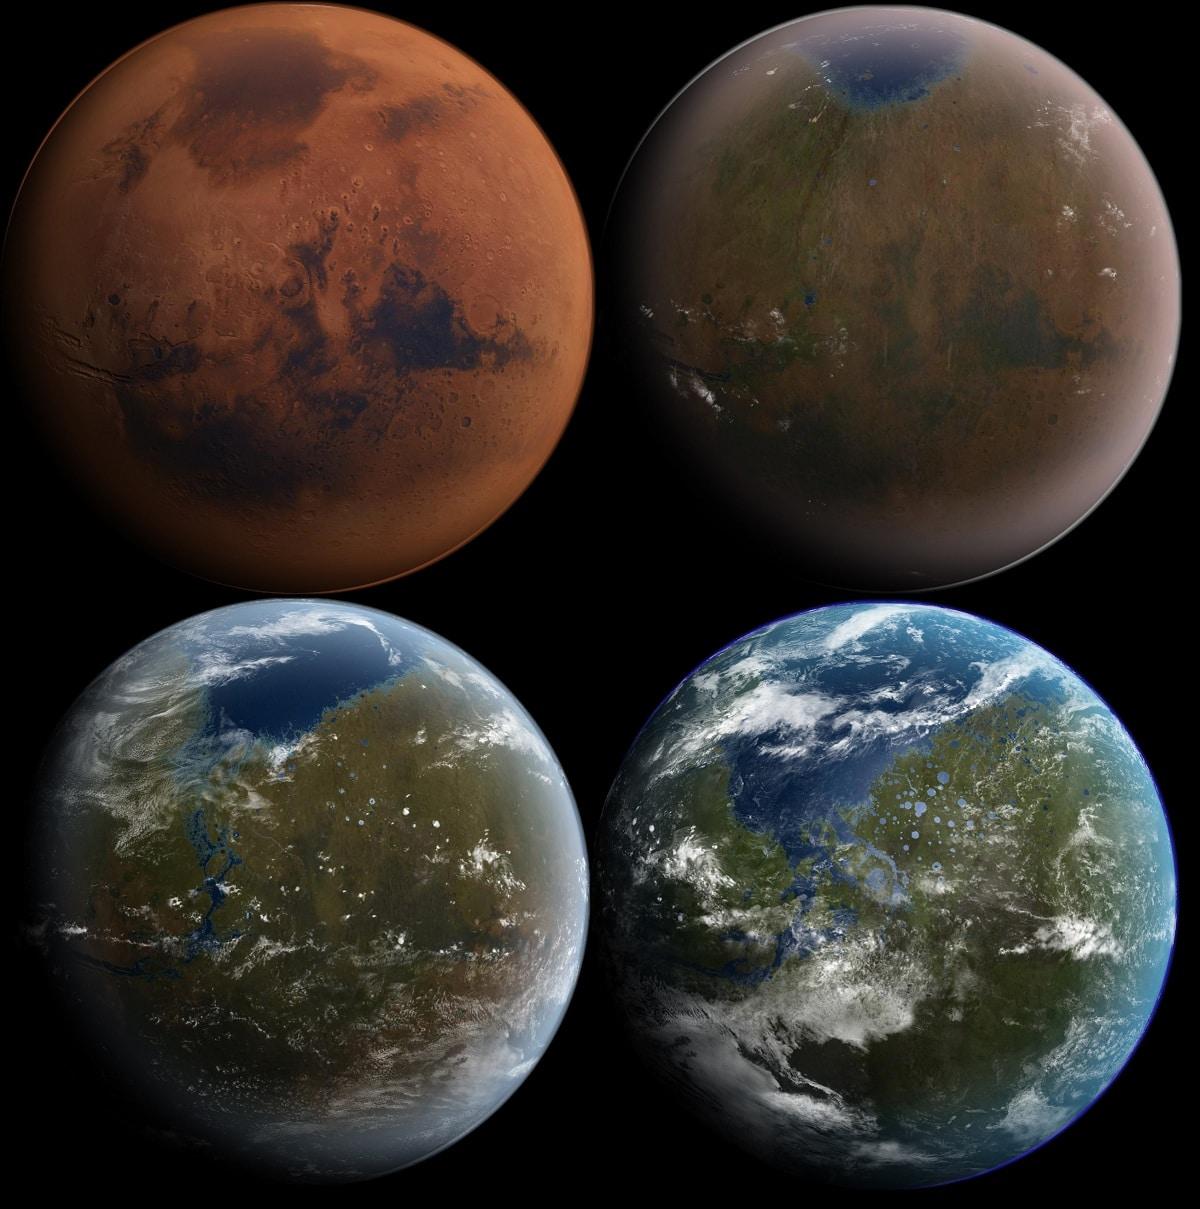 terraformacion de planetas